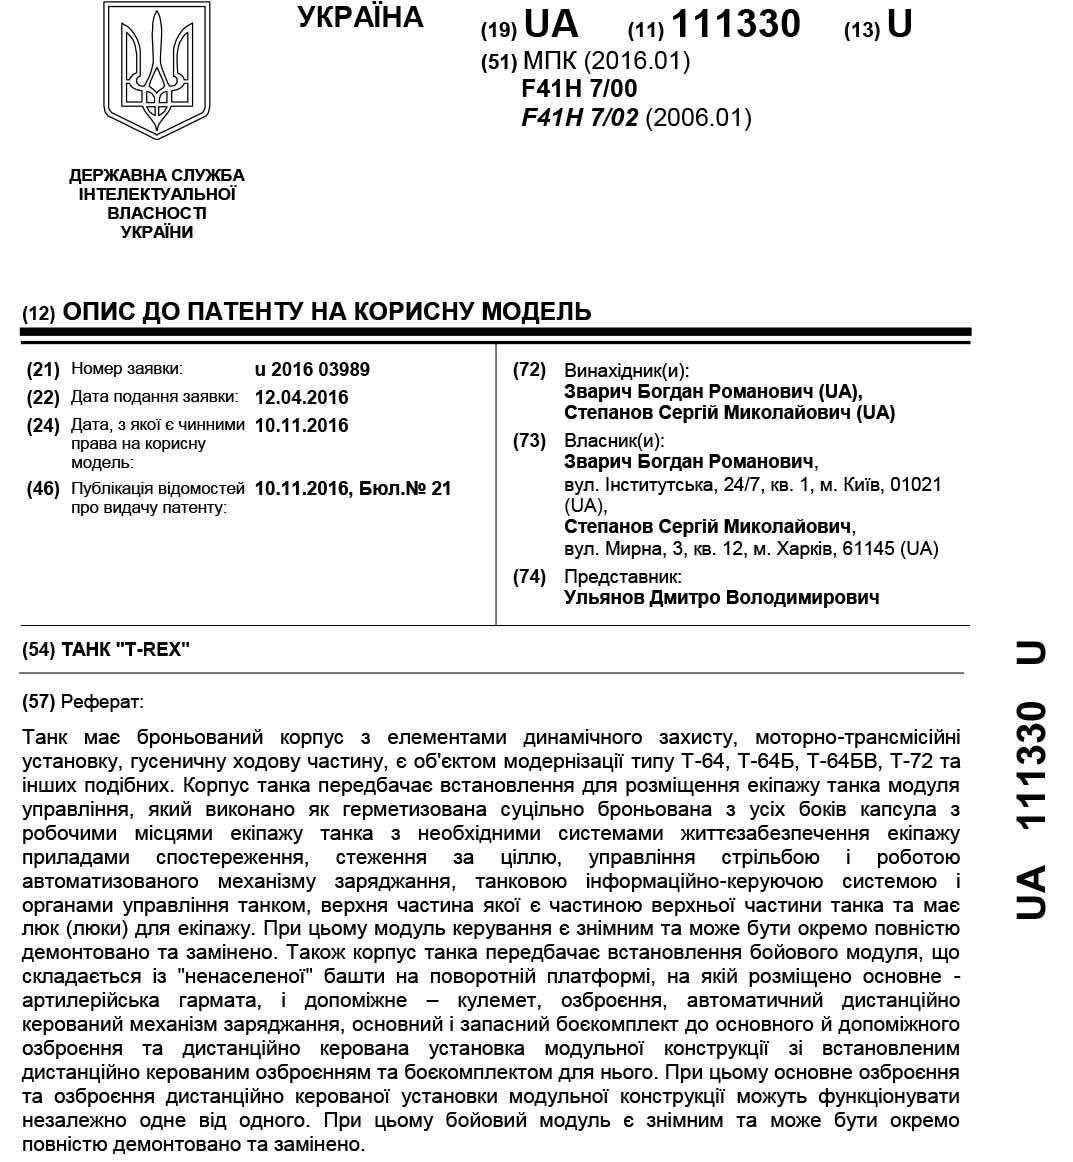 Вгосударстве Украина изобрели конкурента русского T-14 «Армата»